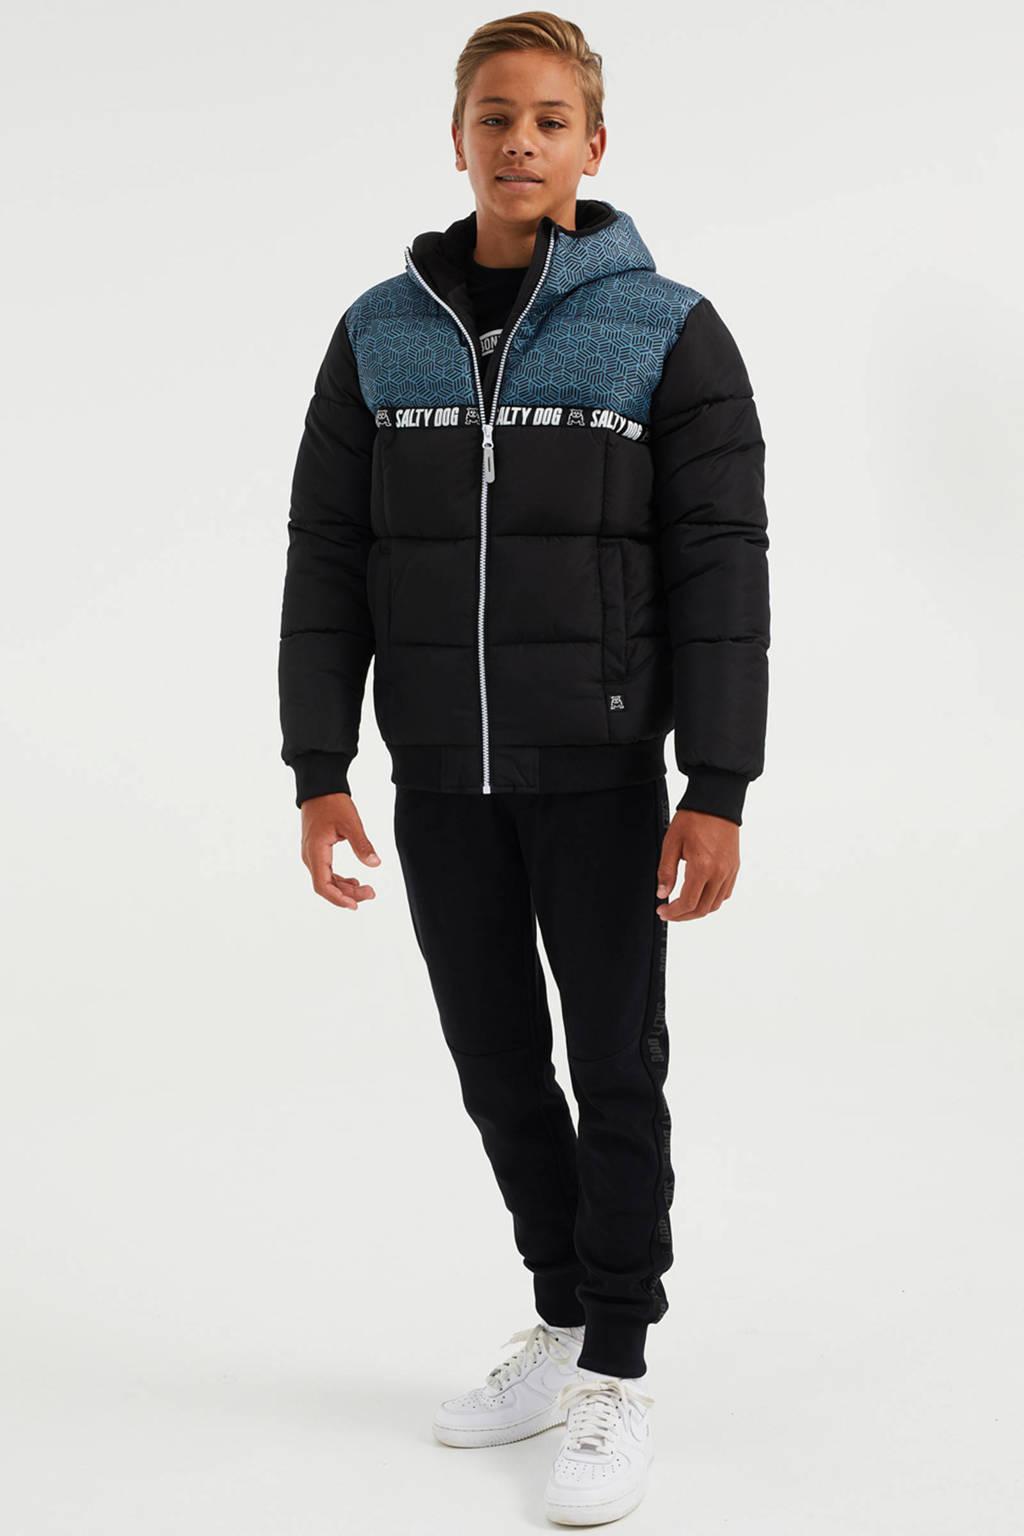 WE Fashion Salty Dog gewatteerde winterjas van gerecycled polyester zwart/blauw, Zwart/blauw